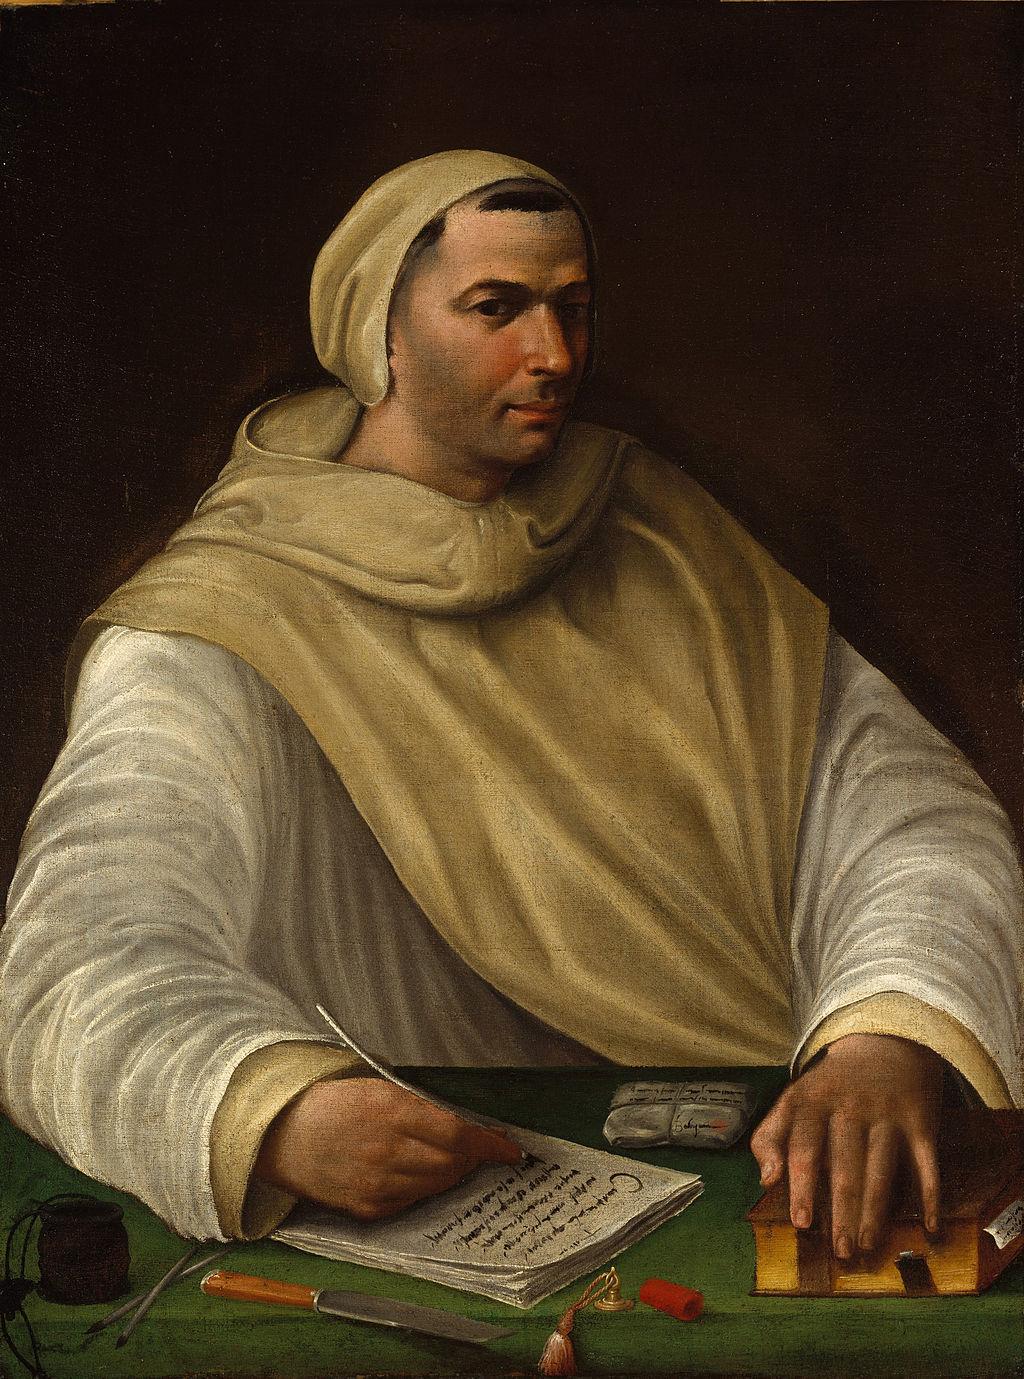 1024px-Portrait_of_an_Olivetan_Monk_-_Battista_Franco_(attributed)